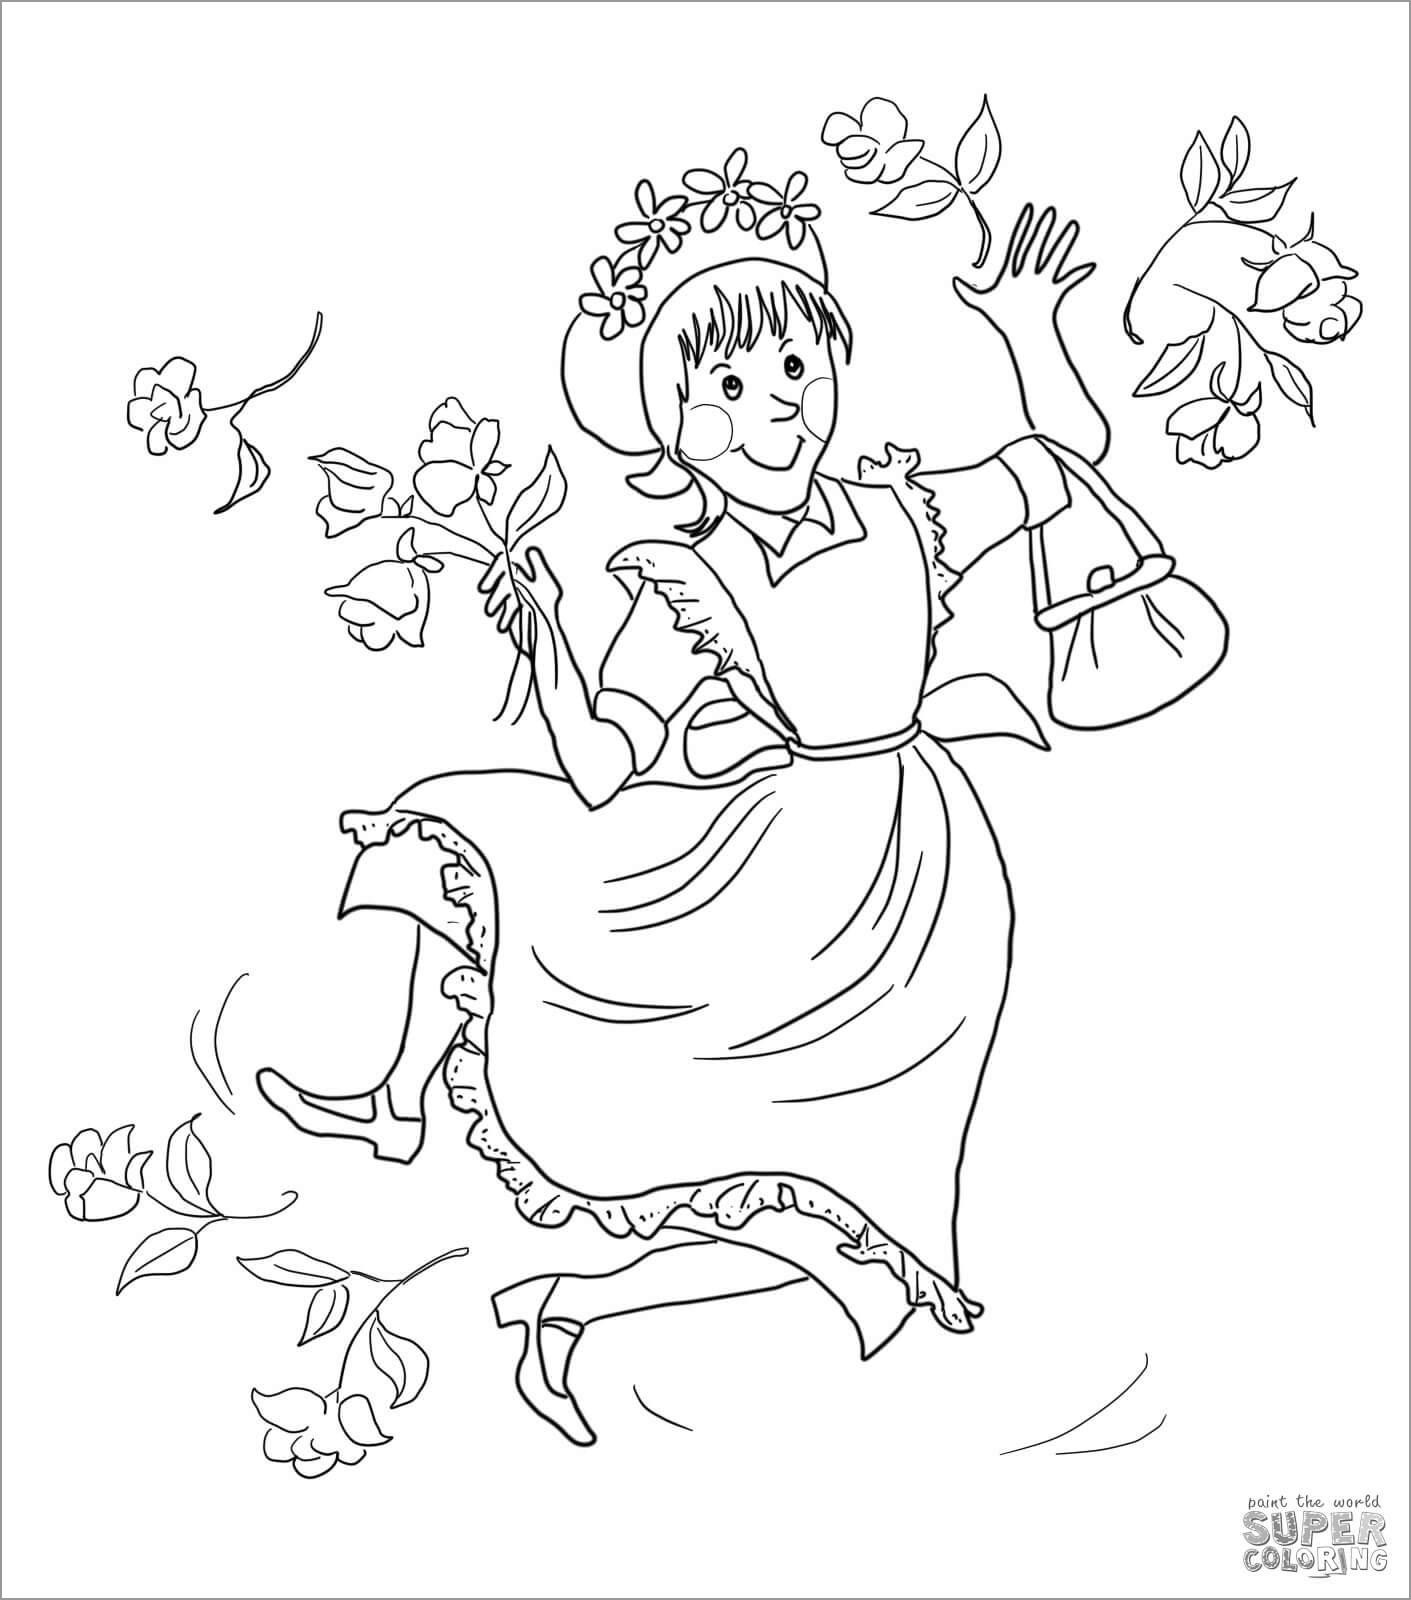 Amelia Bedelia Coloring Page to Print